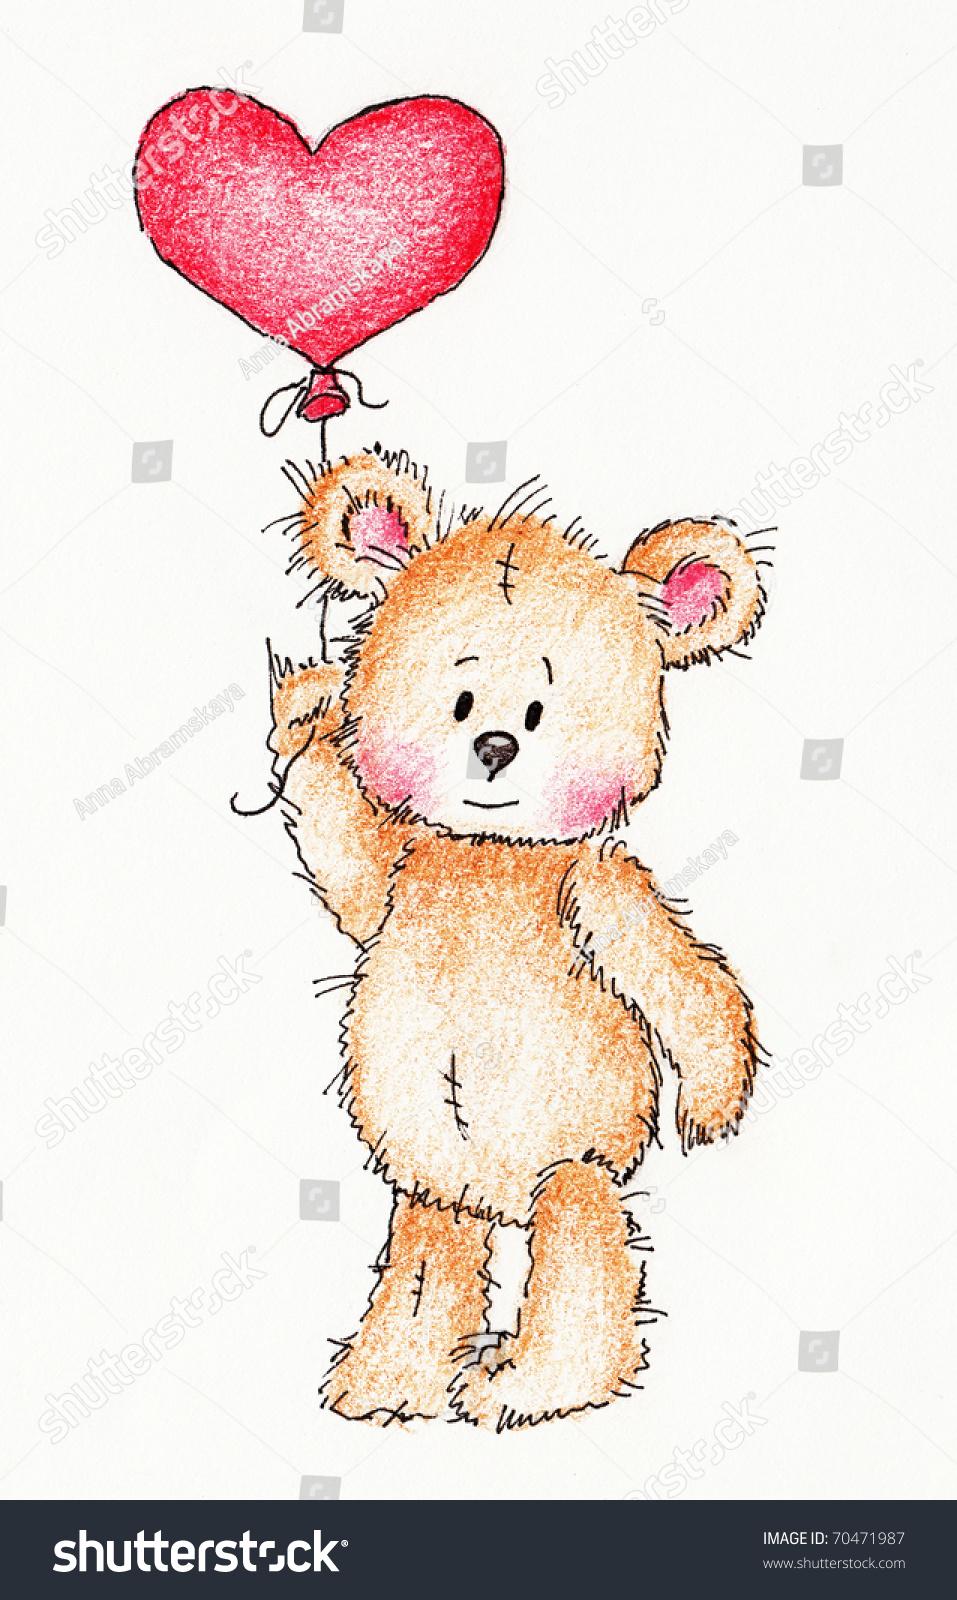 Cute Teddy Bear Red Heart Balloon Stockillustration 70471987 ...